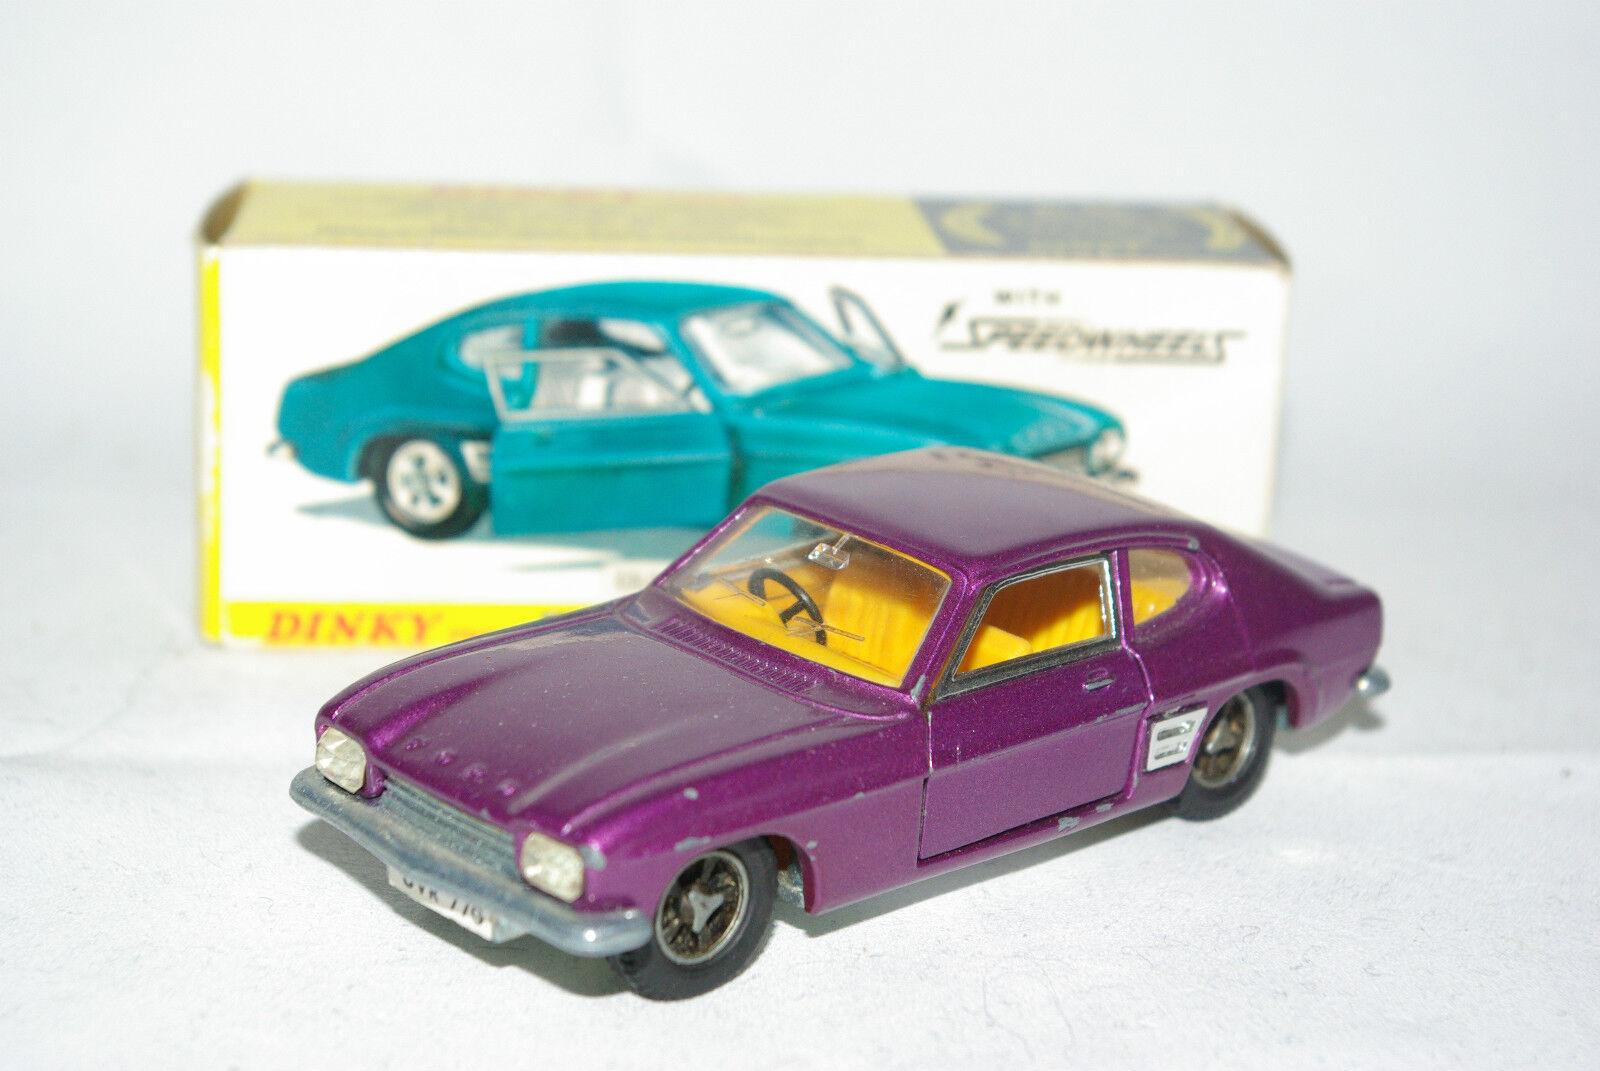 DINKY TOYS 165 FORD CAPRI violet NEAR MINT BOXED RARE SELTEN RARO